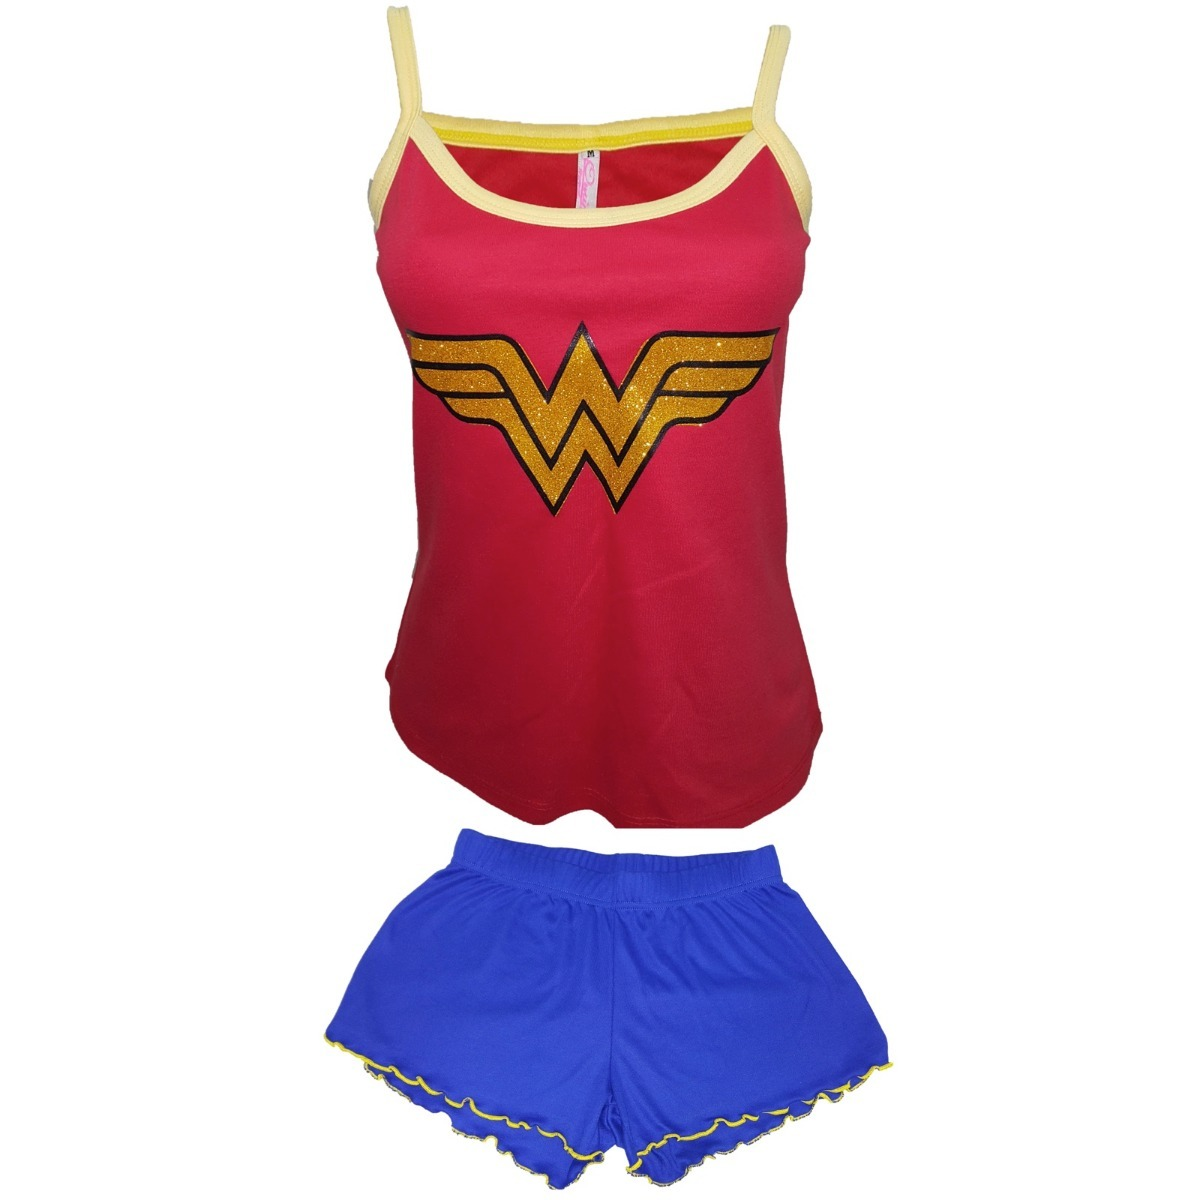 b5b60ebd5c pijama mujer maravilla dc comics superheroes franela algodo. Cargando zoom.